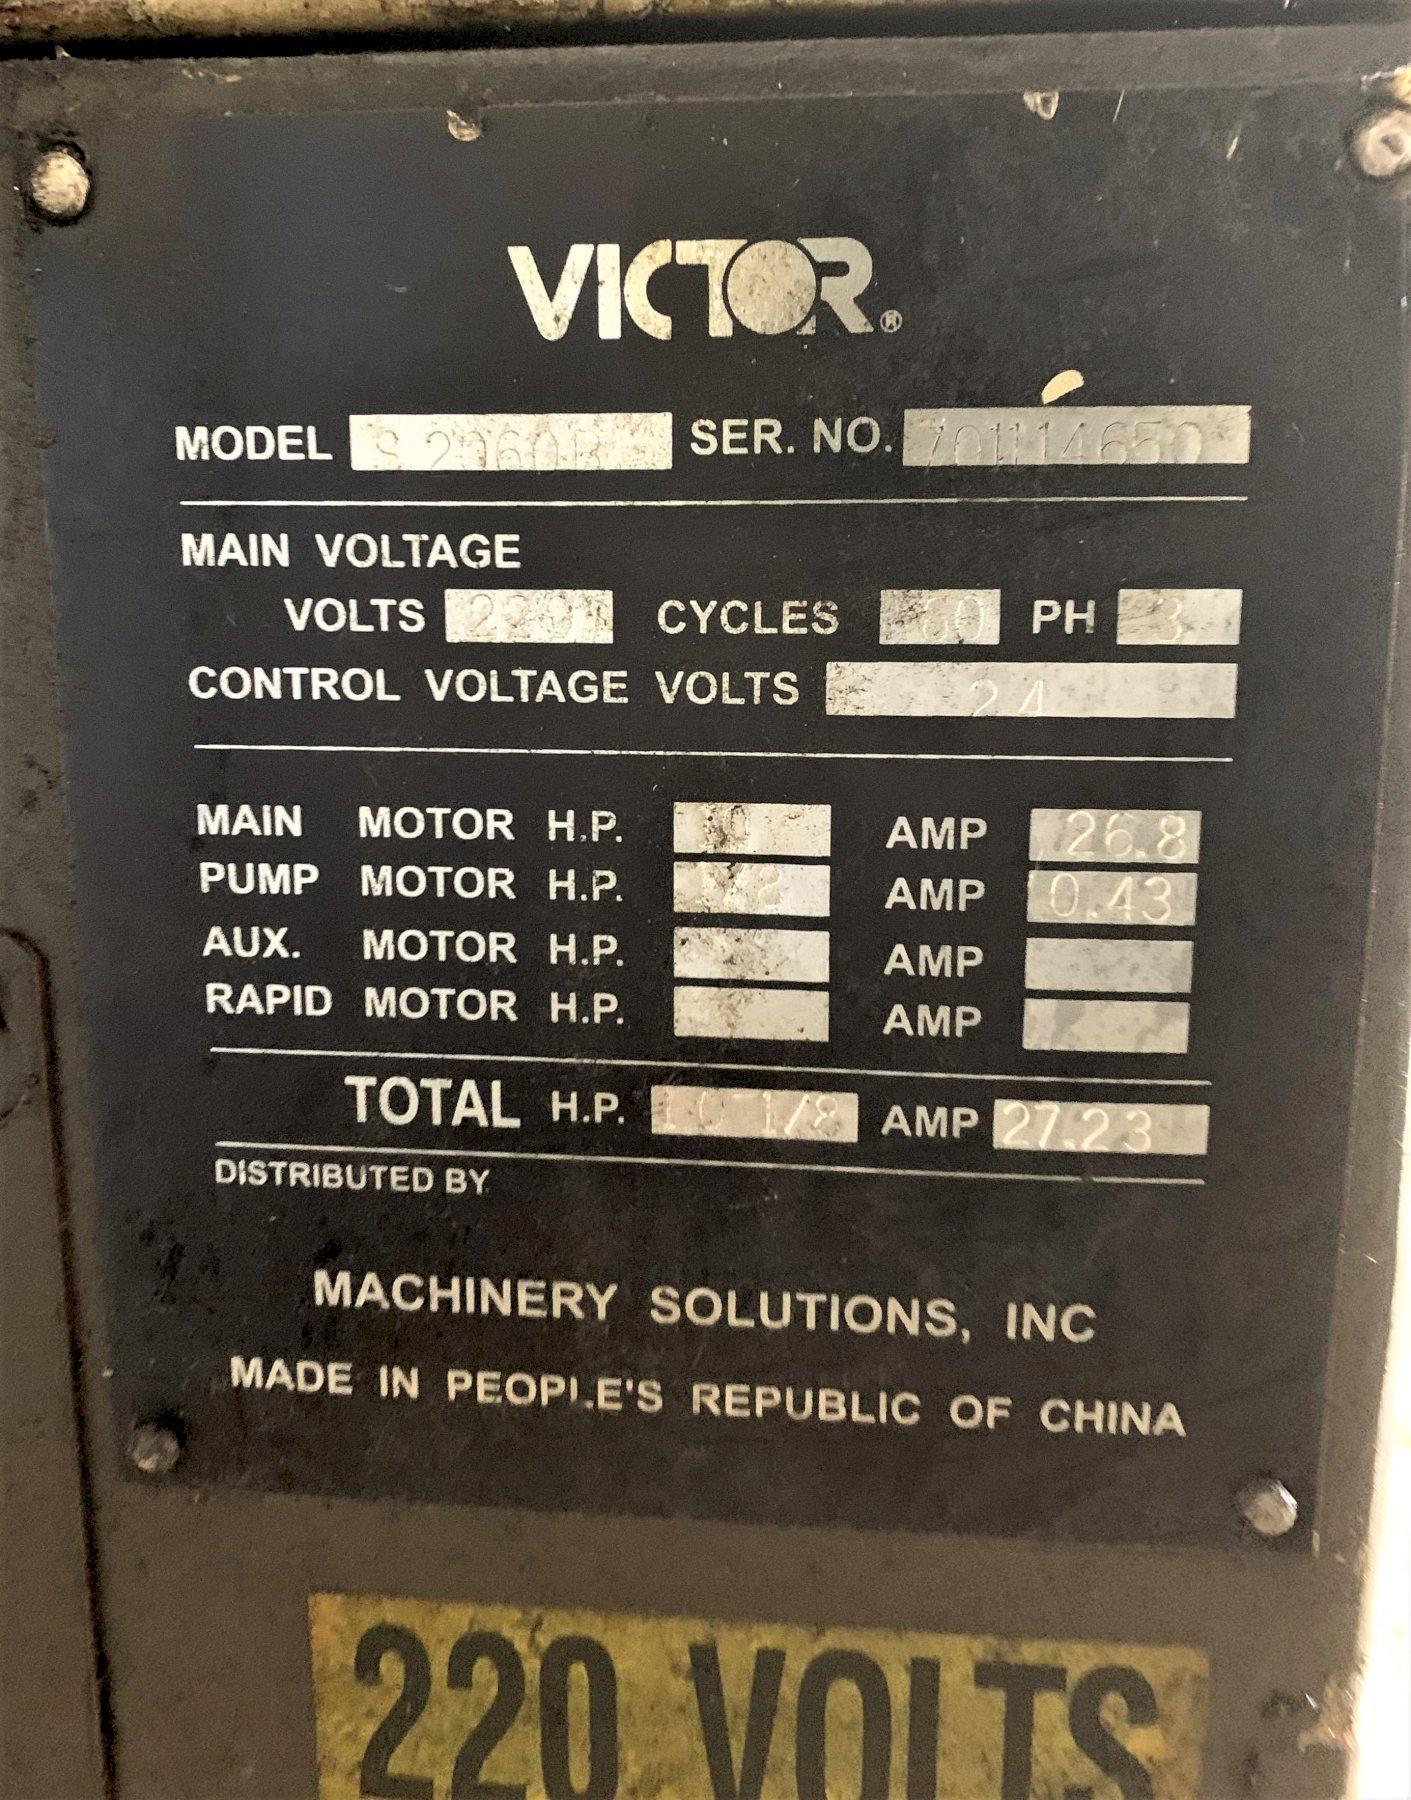 Victor Model S2060B Engine Lathe, S/N 701114650